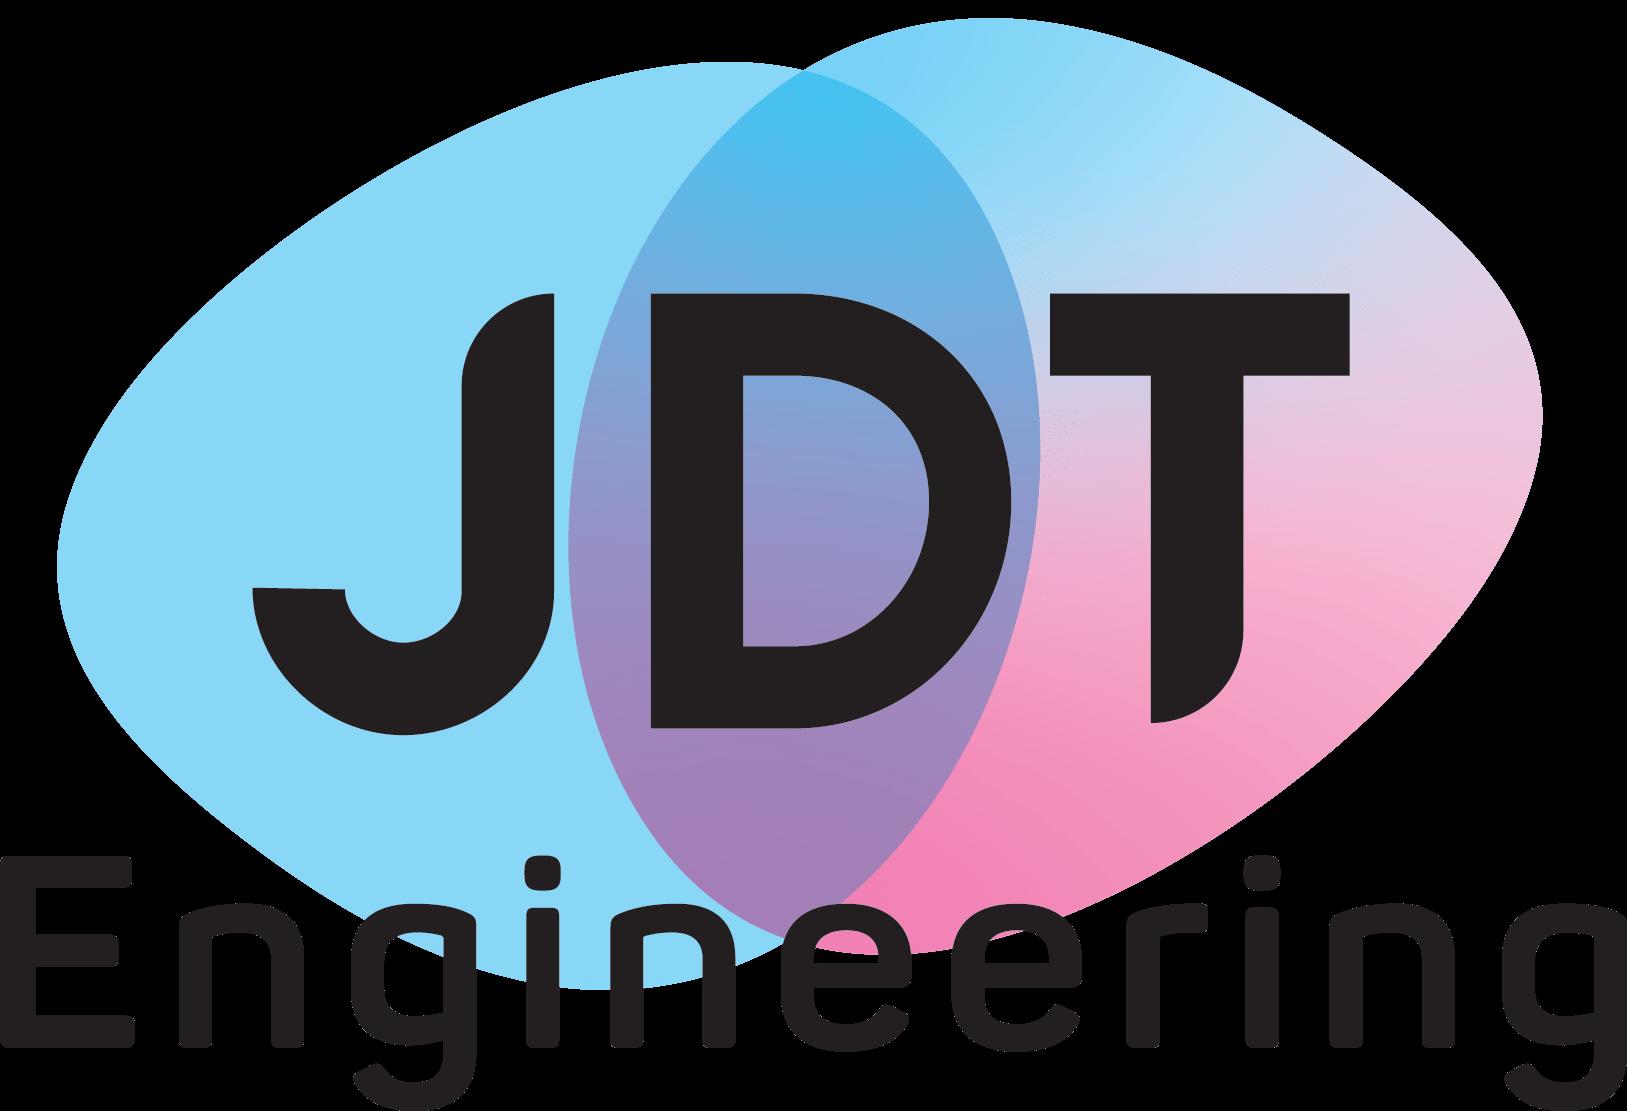 JDT Engineering